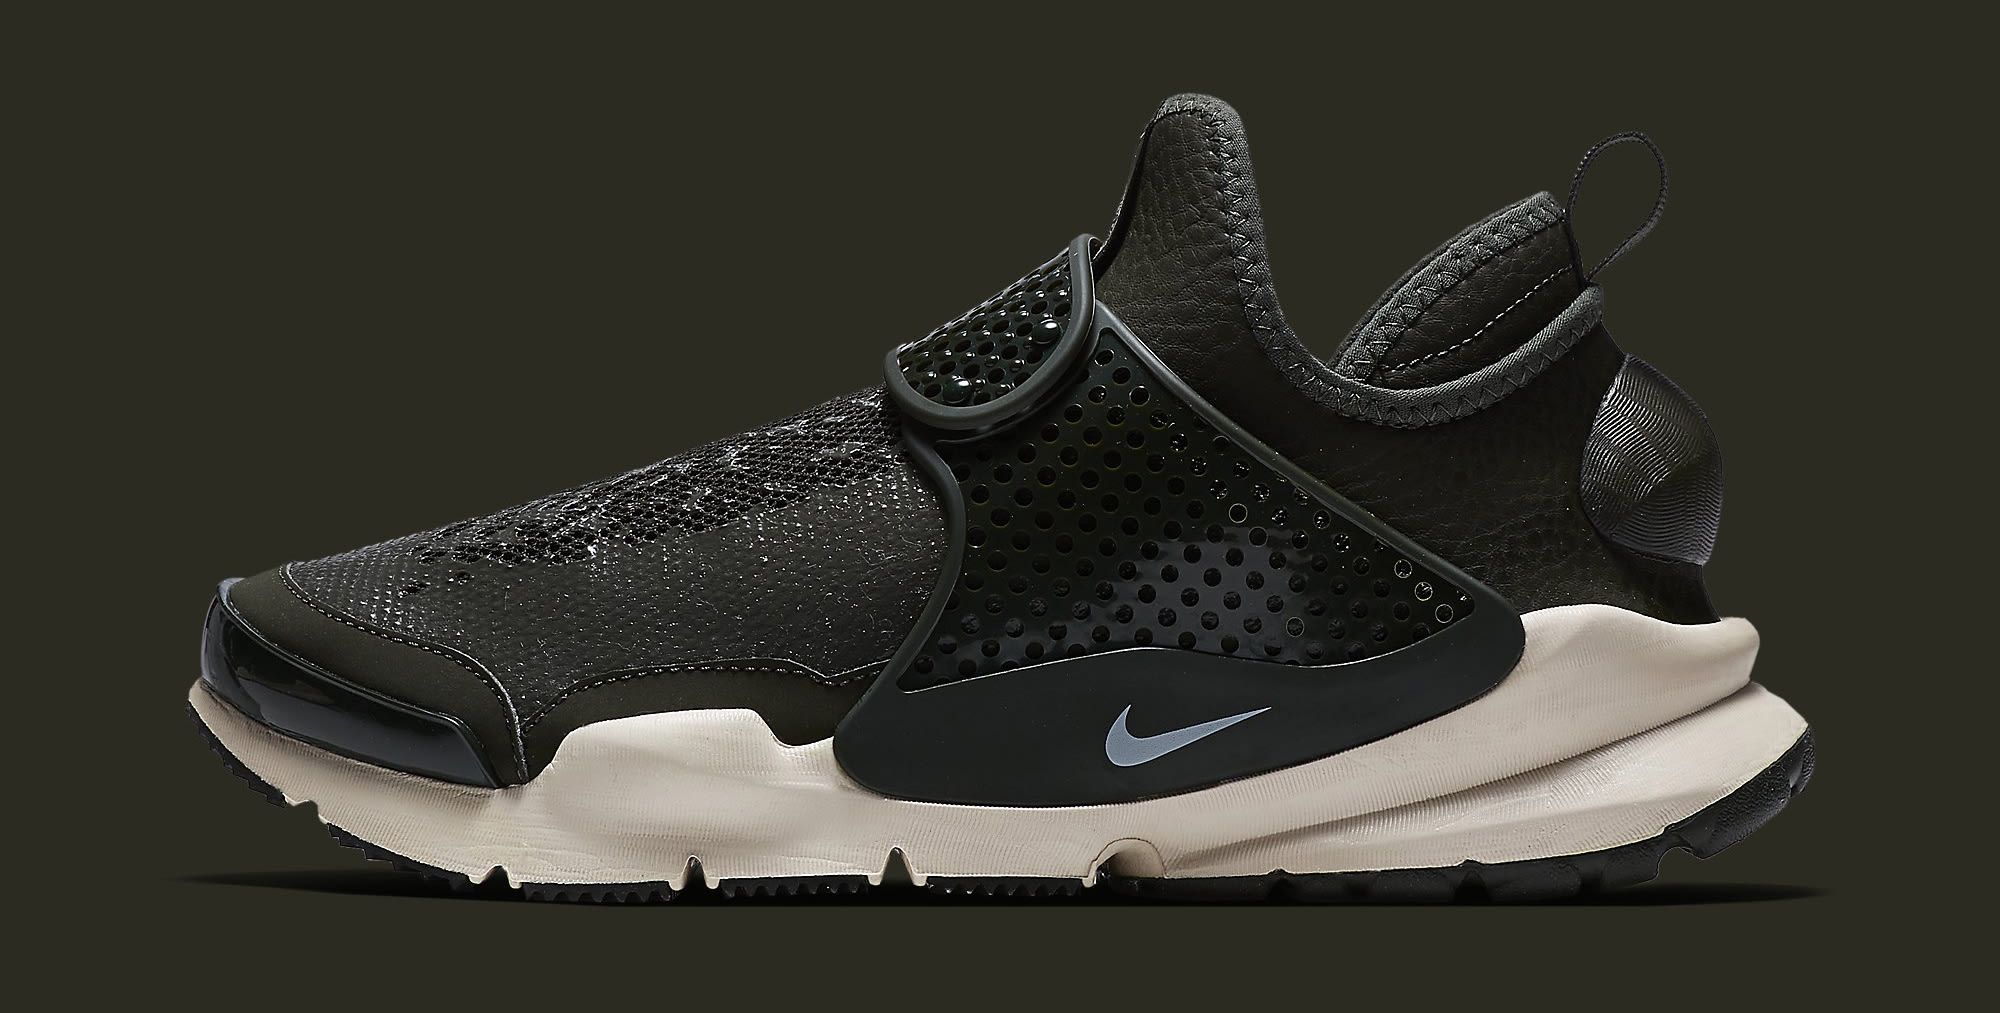 Stone Island Nike Sock Dart 910090-300 Medial